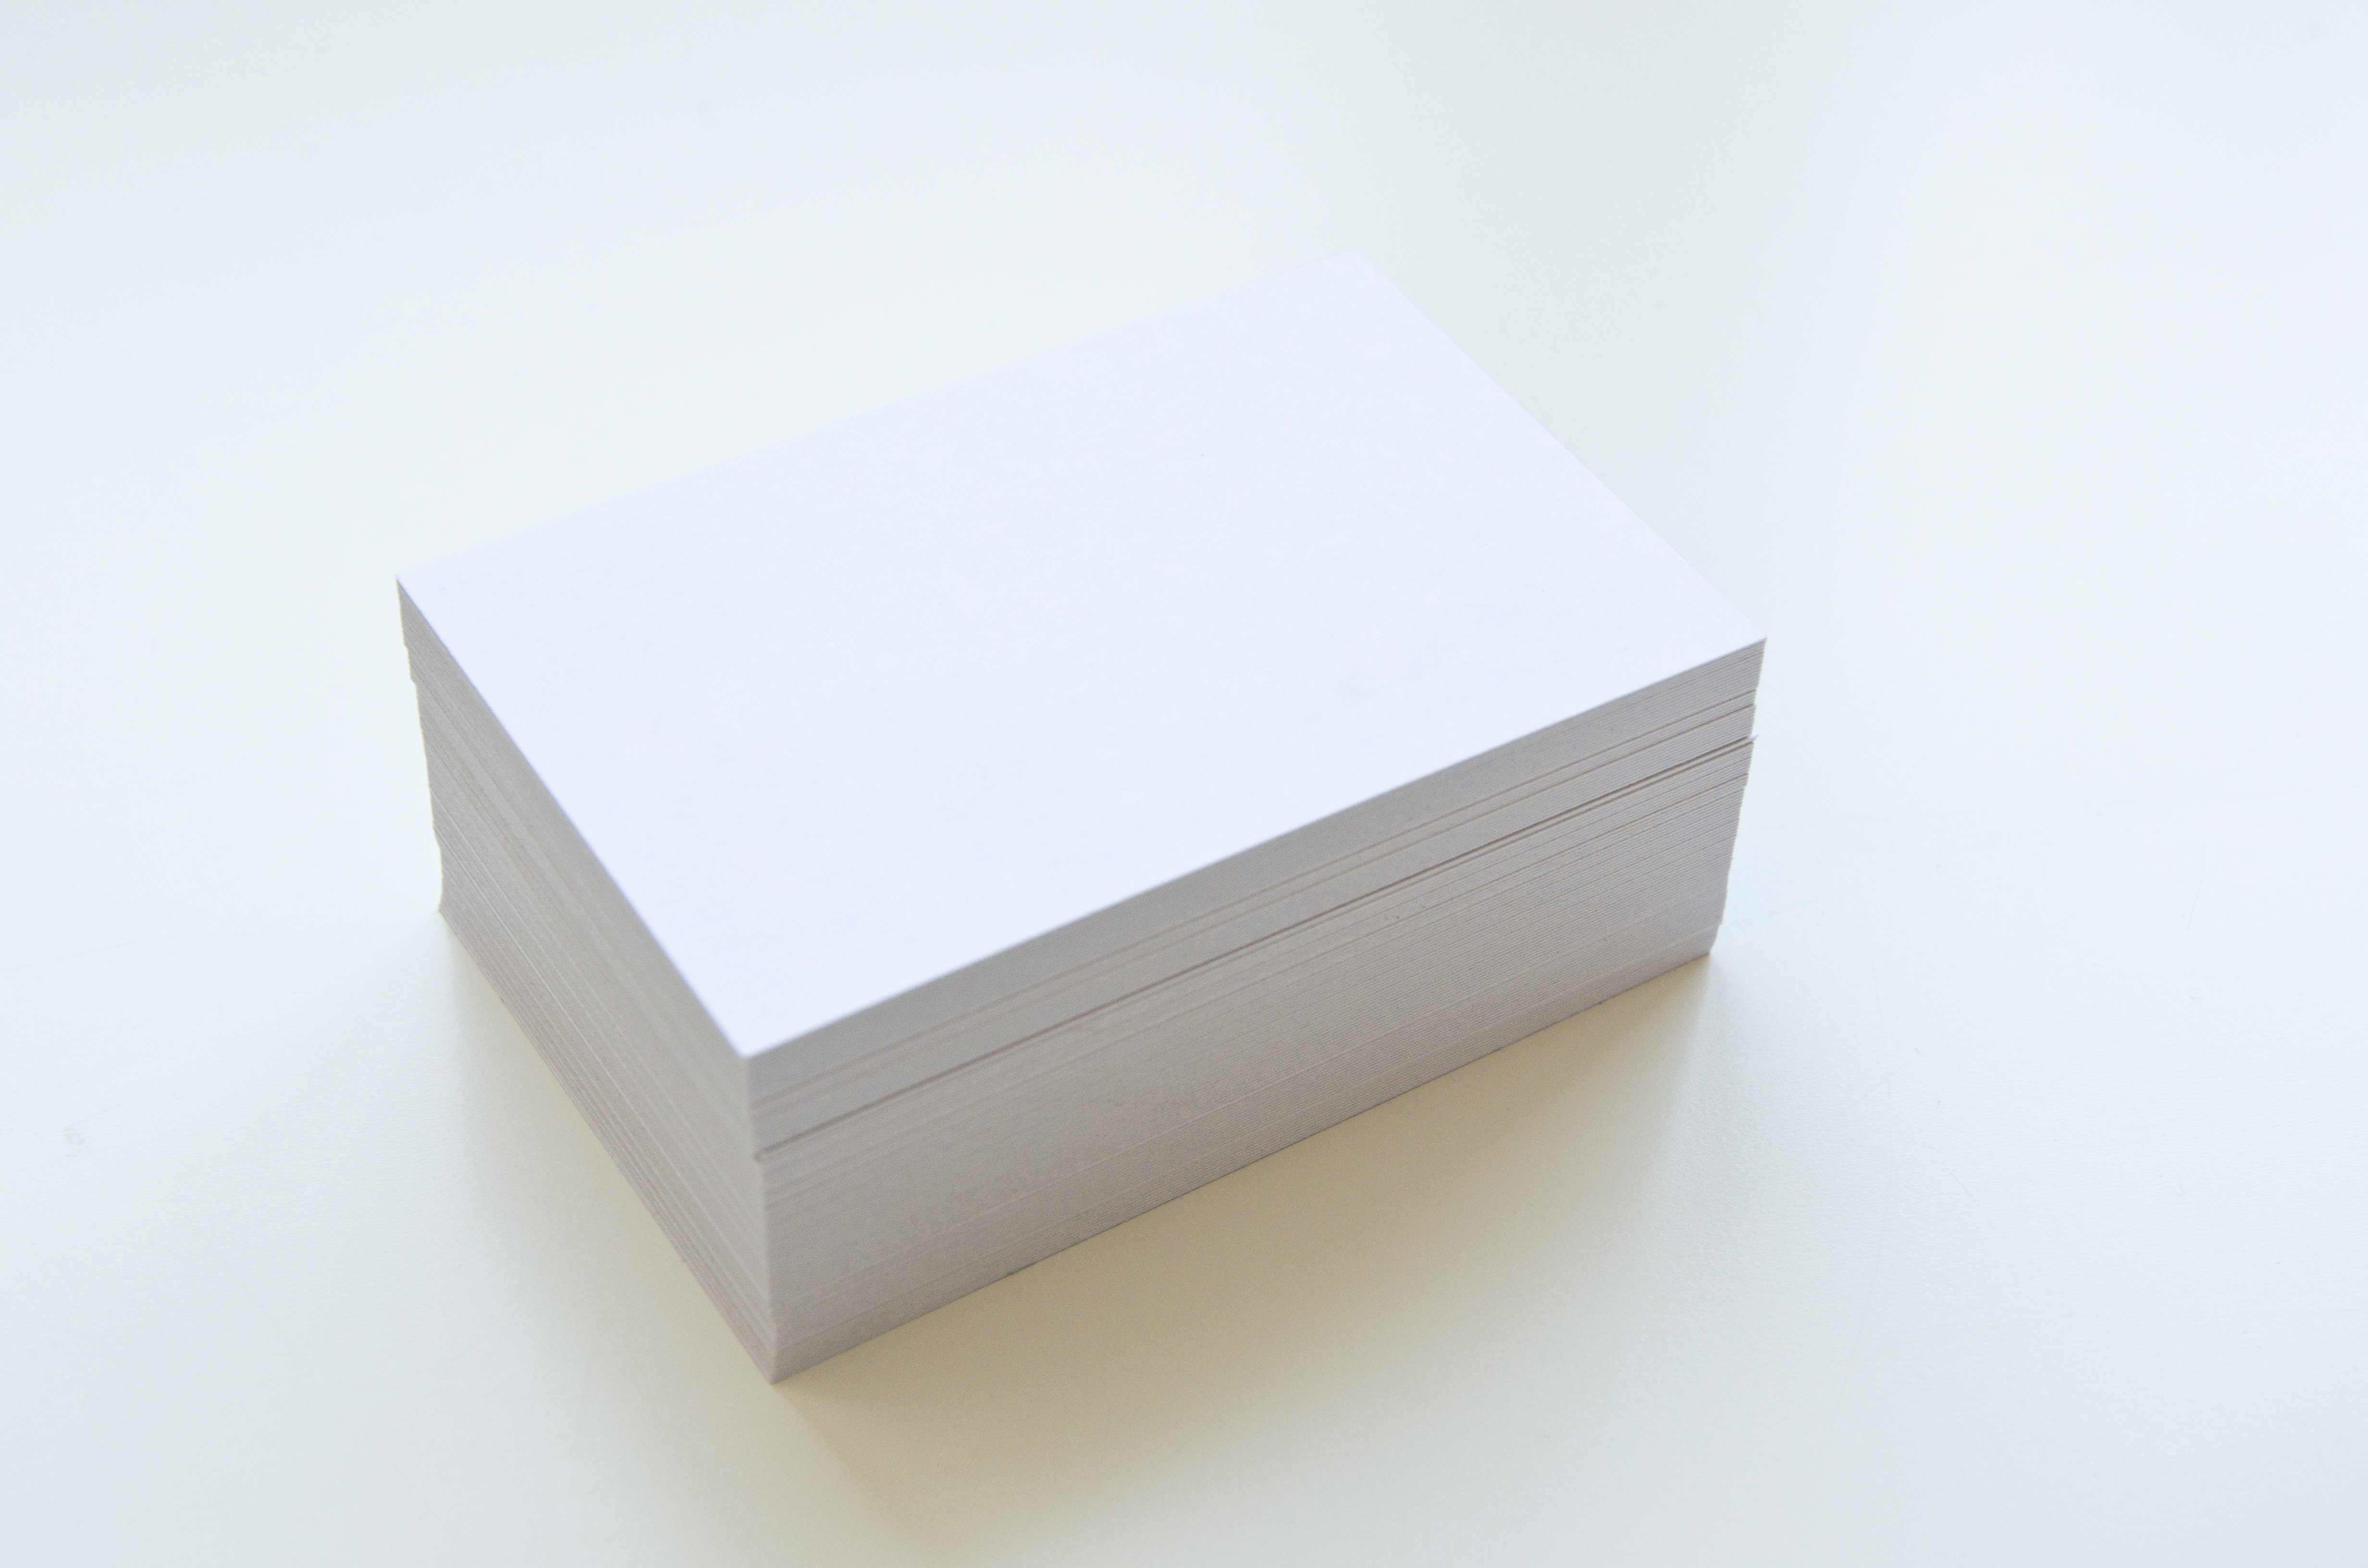 Blank paper white